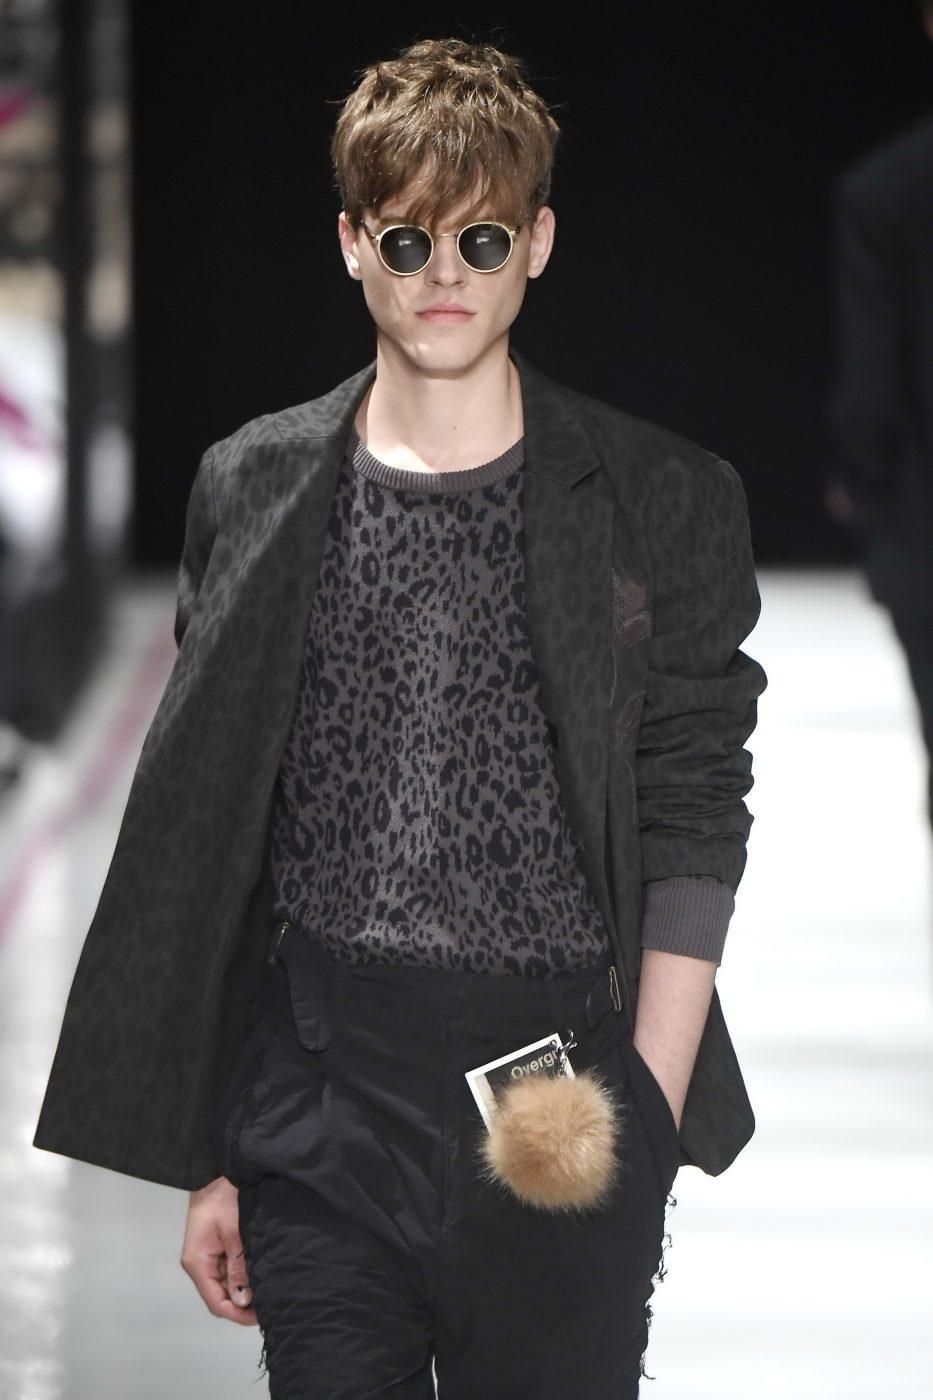 Robert Geller Menswear SS 2017 Fur Pom Pom